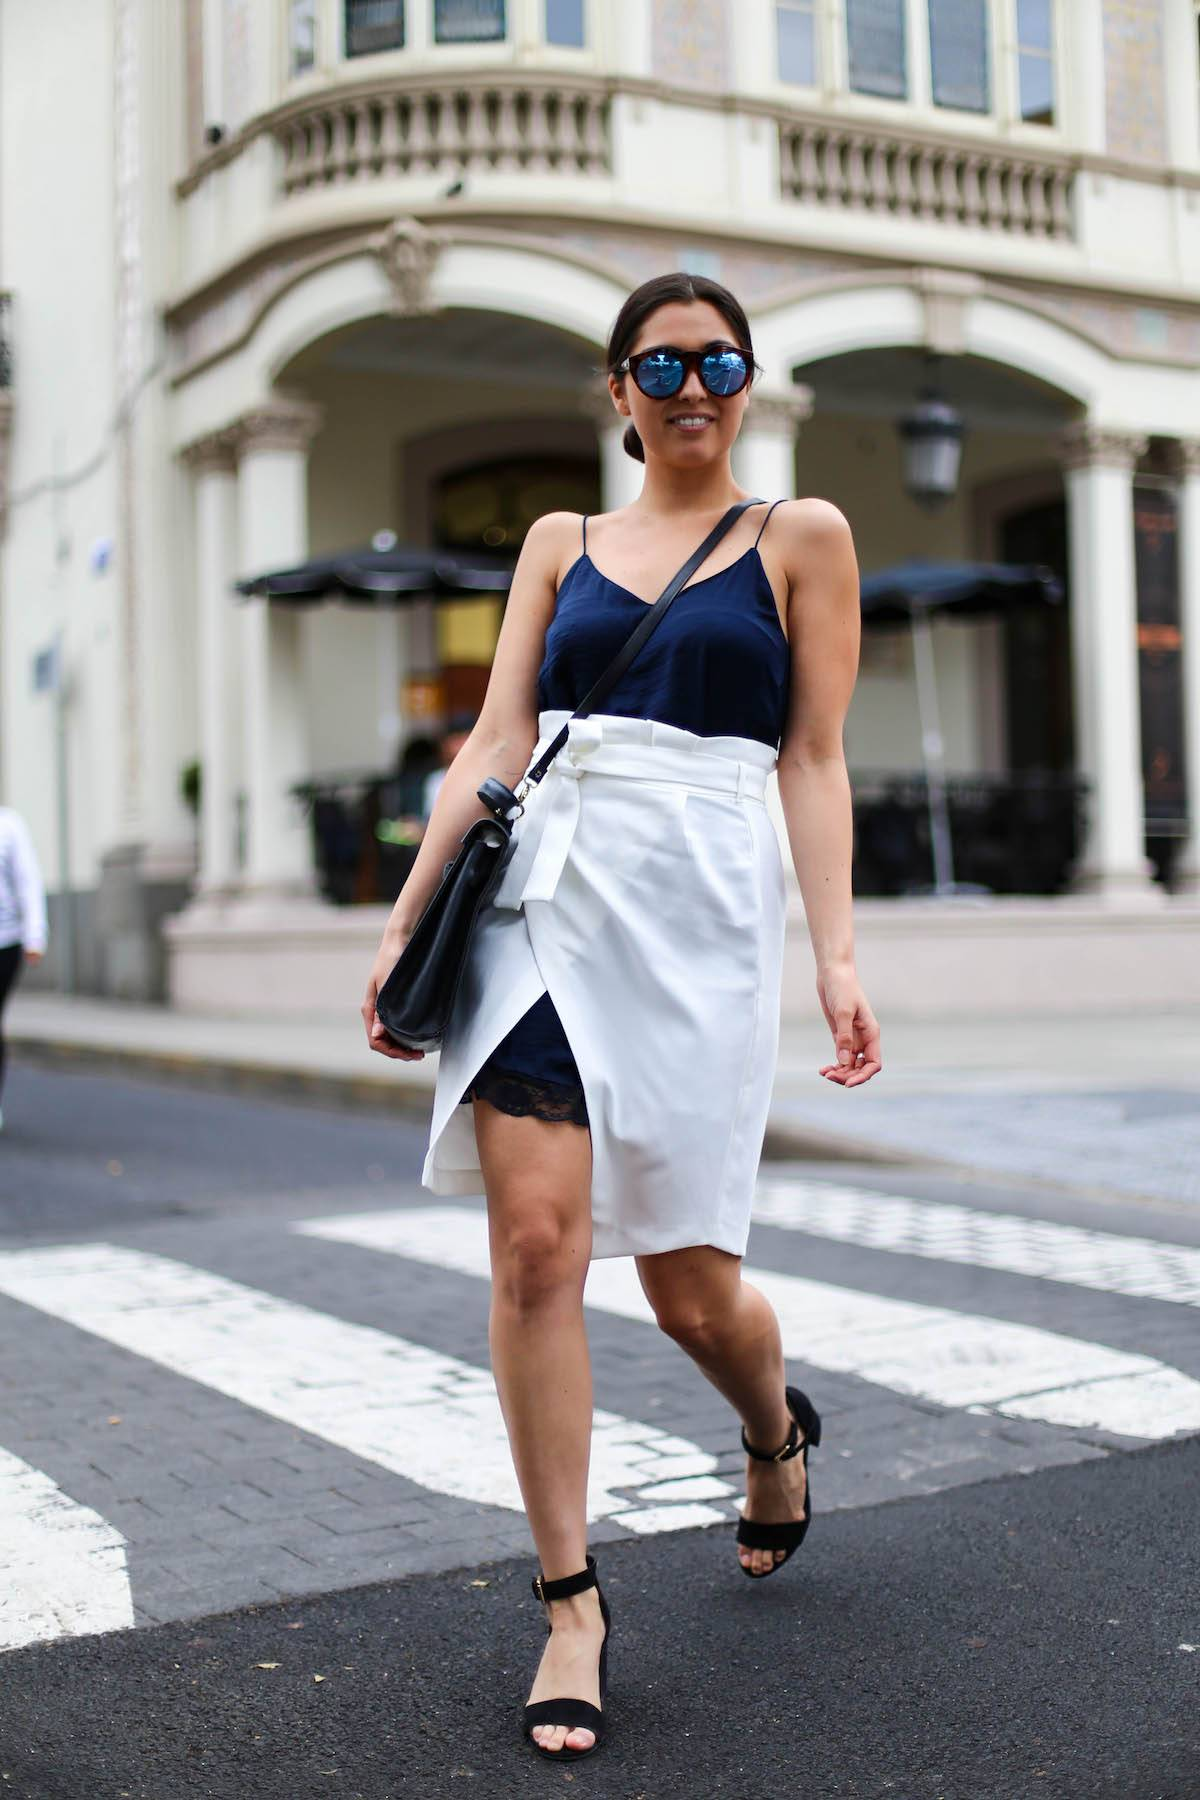 Lingerie Dress - Streetstyle - Casual - Streetstyle Las Palmas - German Fashionblog - Vintage Hermés - Summerlook - Wrap Skirt - Stradivarius - Ootd